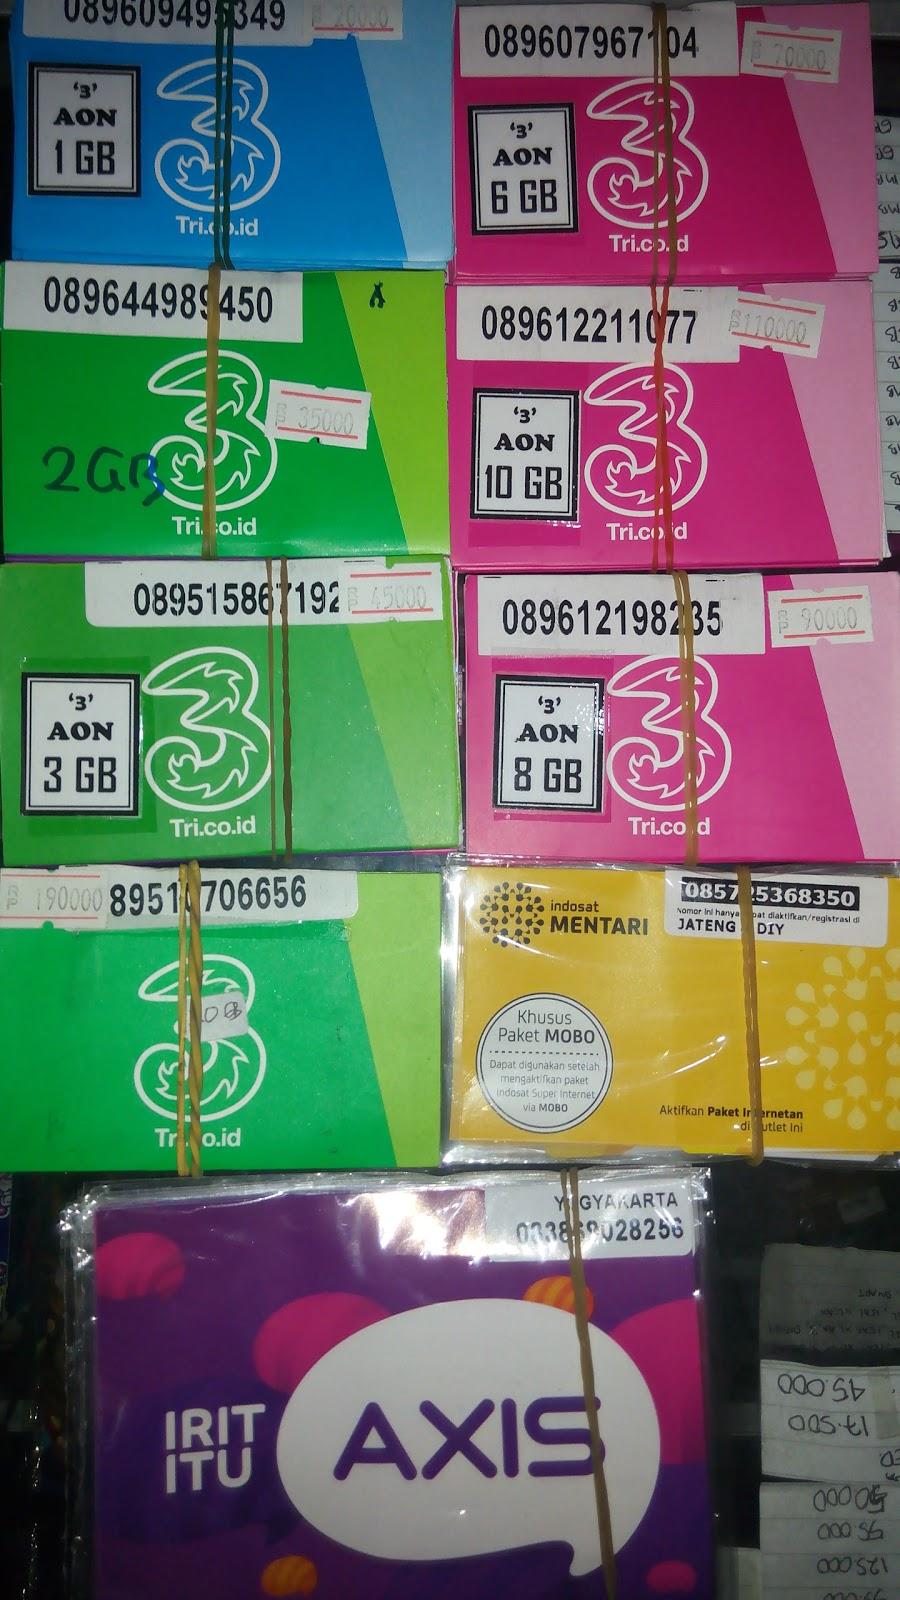 Halfaz Jogja Perdana Internet 3 Aon Sep2015 Paket 2gb 1gb Dan Extra 1 Gb